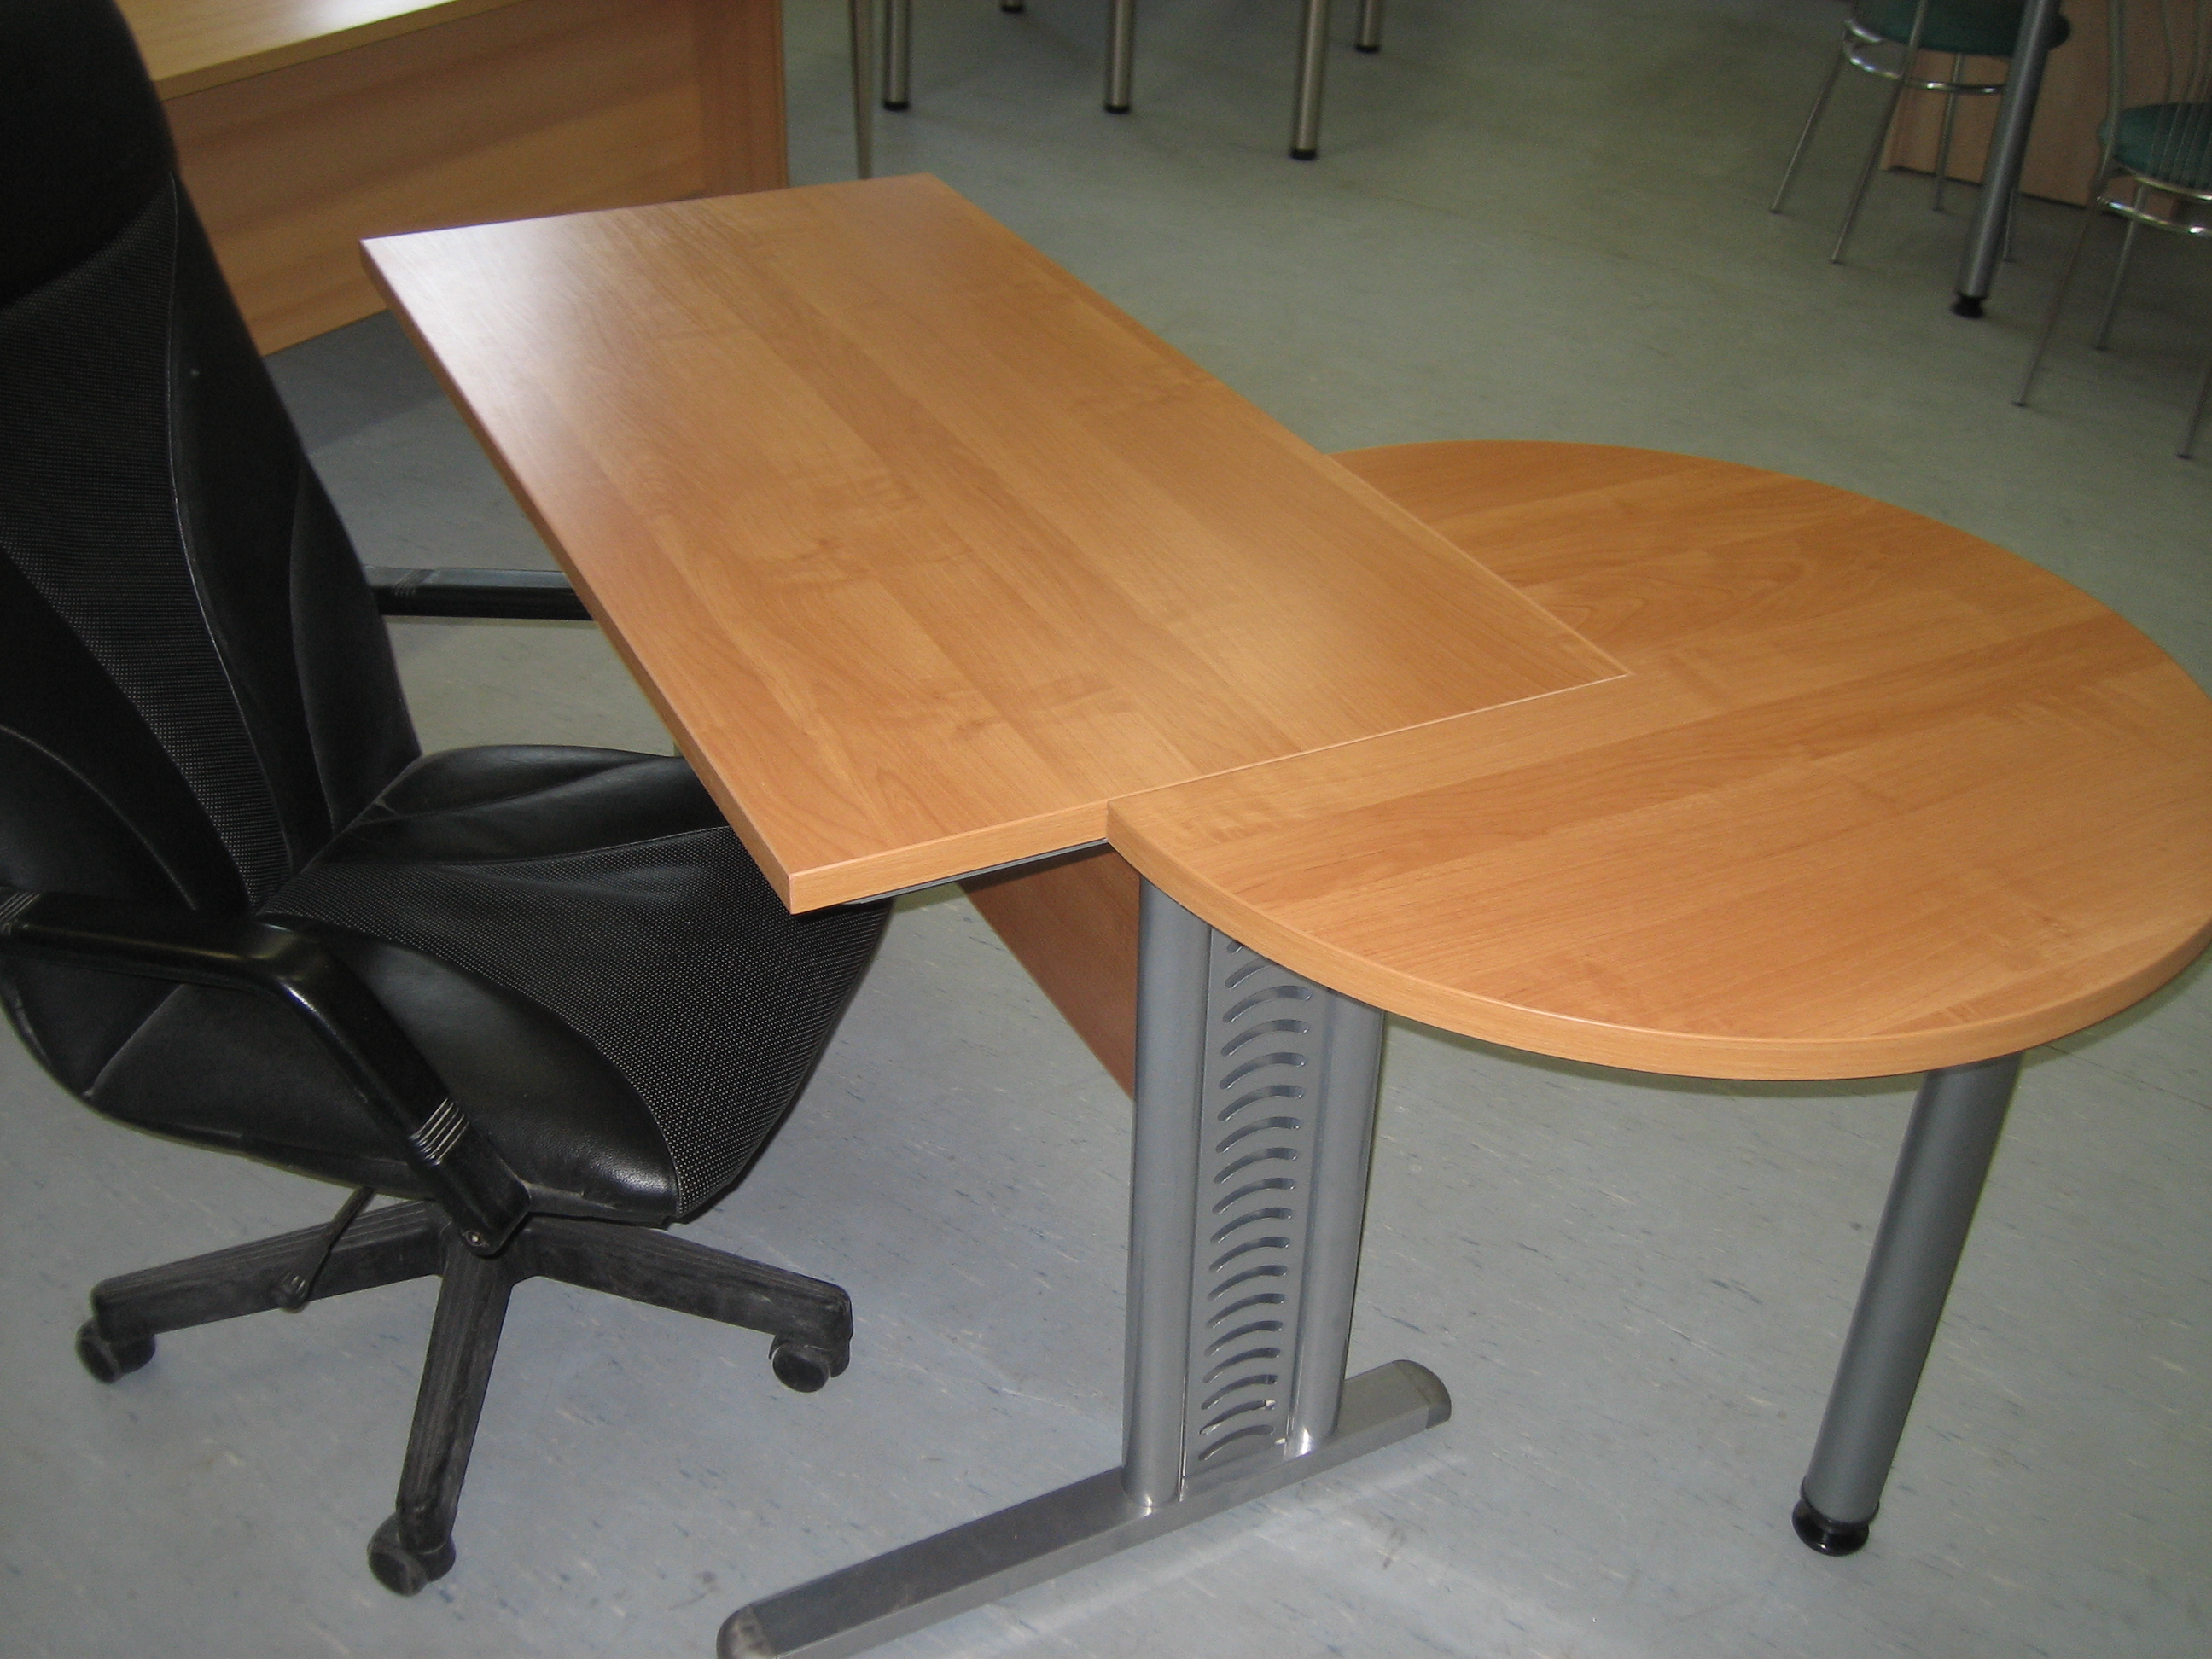 Büromöbel Schreibtisch Büroausstattung in berlin | Büro, Geschäft ...